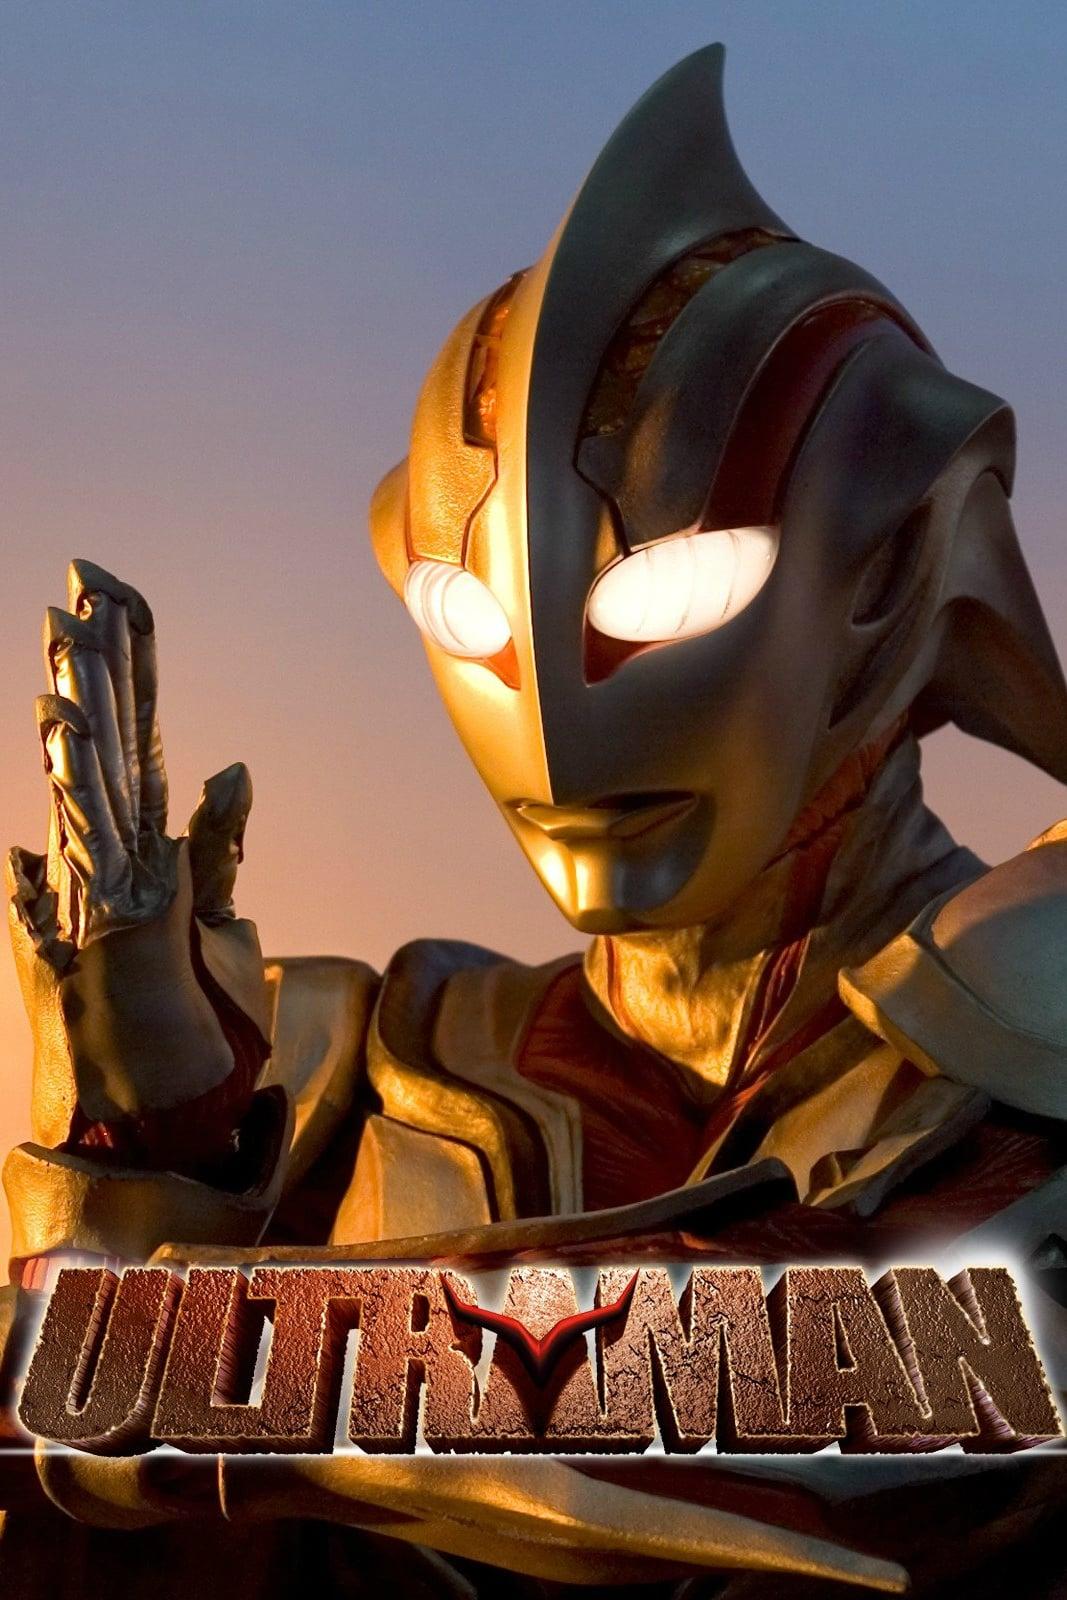 Ultraman Tiga - The Next